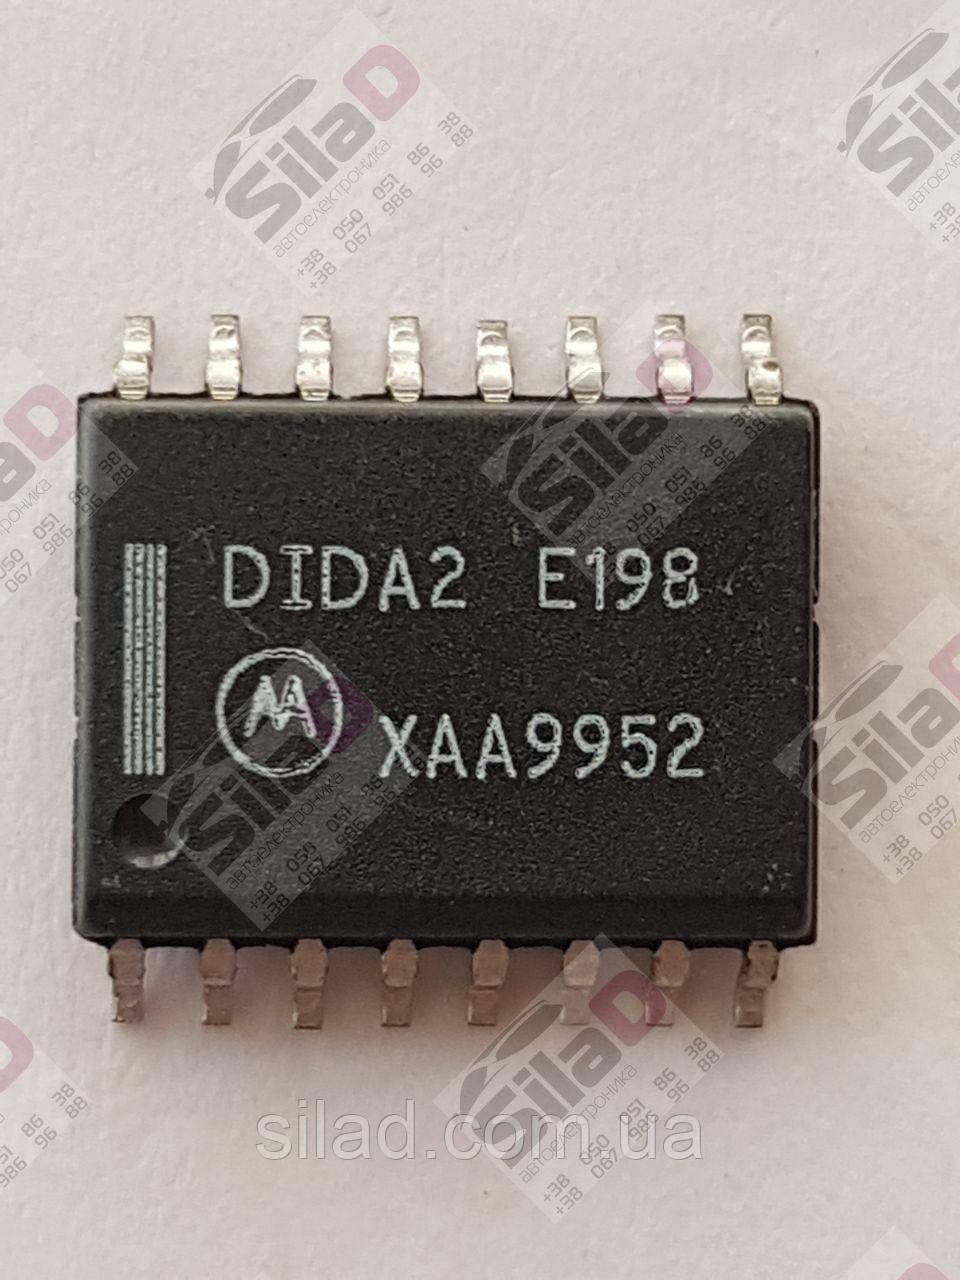 Мікросхема DIDA2 E198 XAA9952 Motorola корпус HTSSOP-16